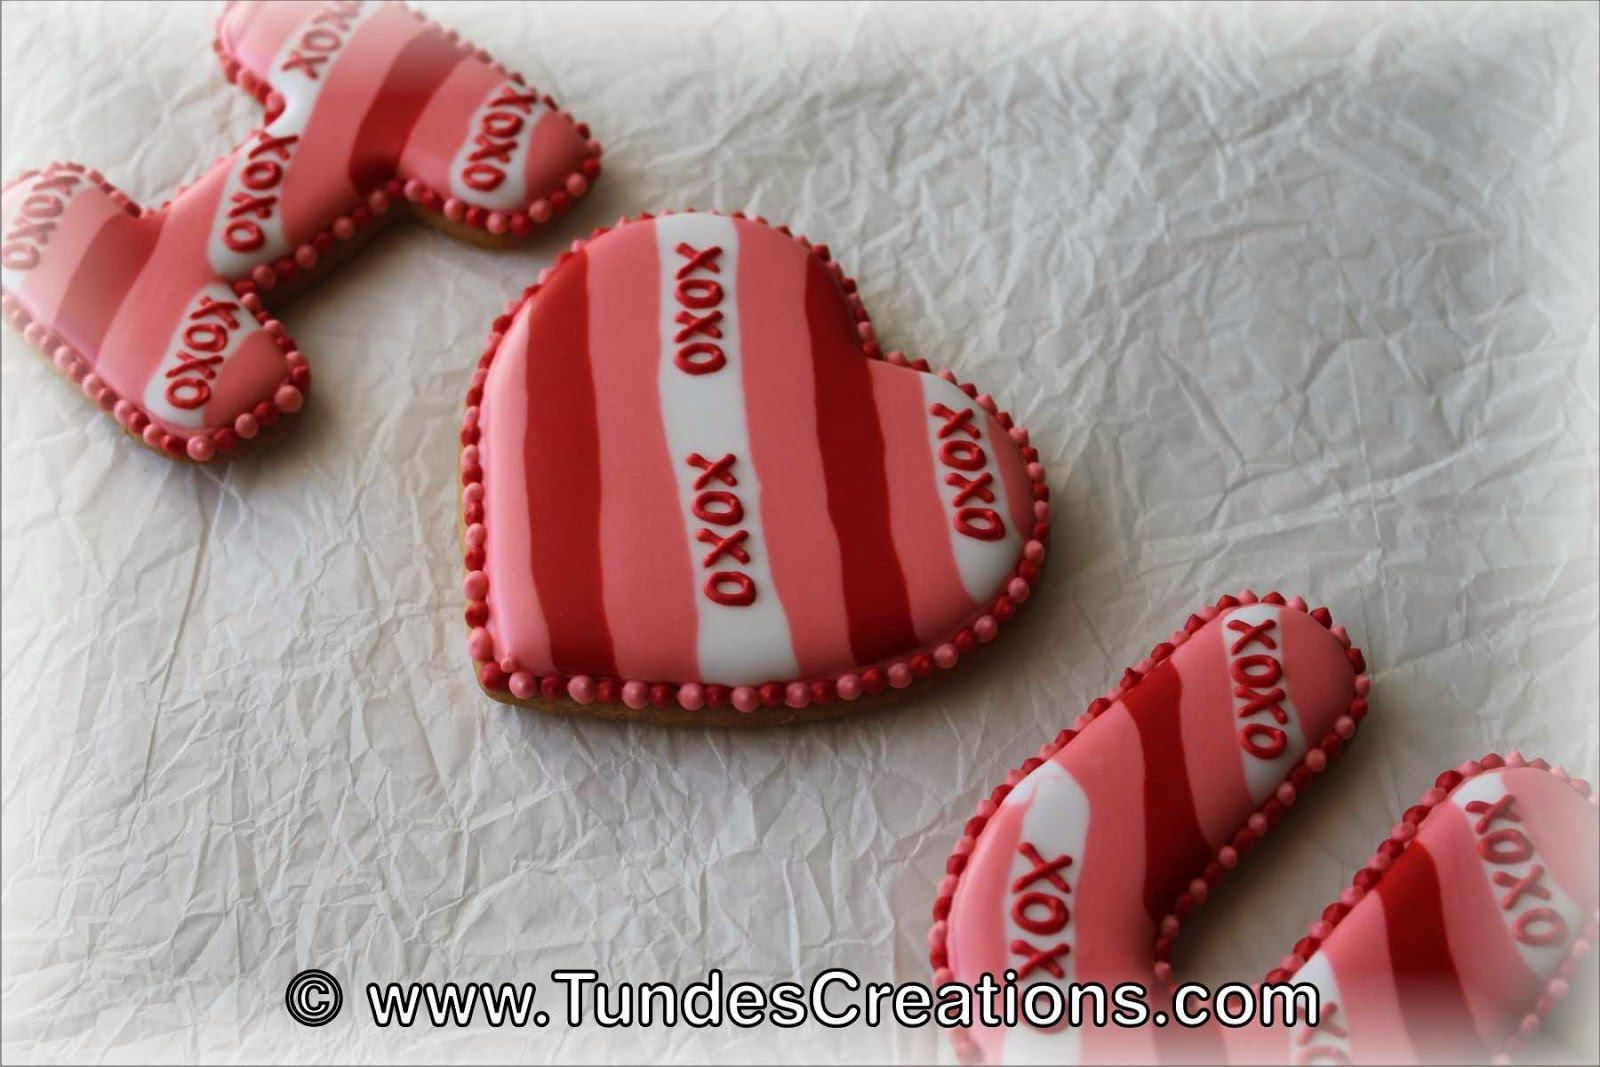 I heart U cookies